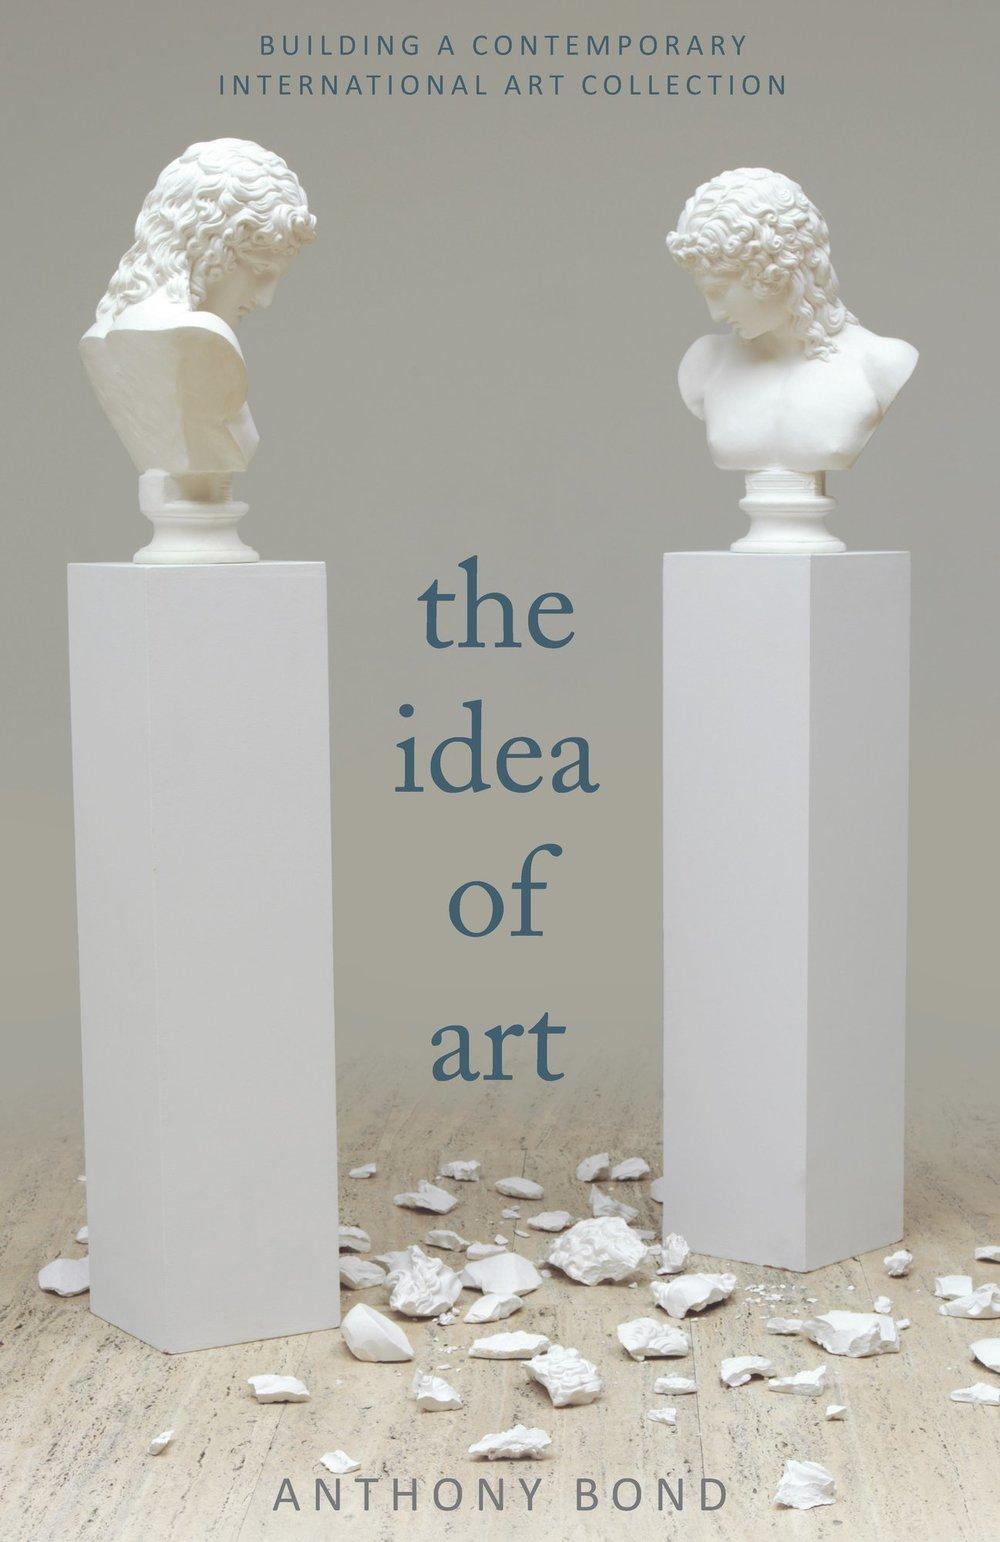 ANTHONY BOND   The Idea of Art  (New South Press, 2015).